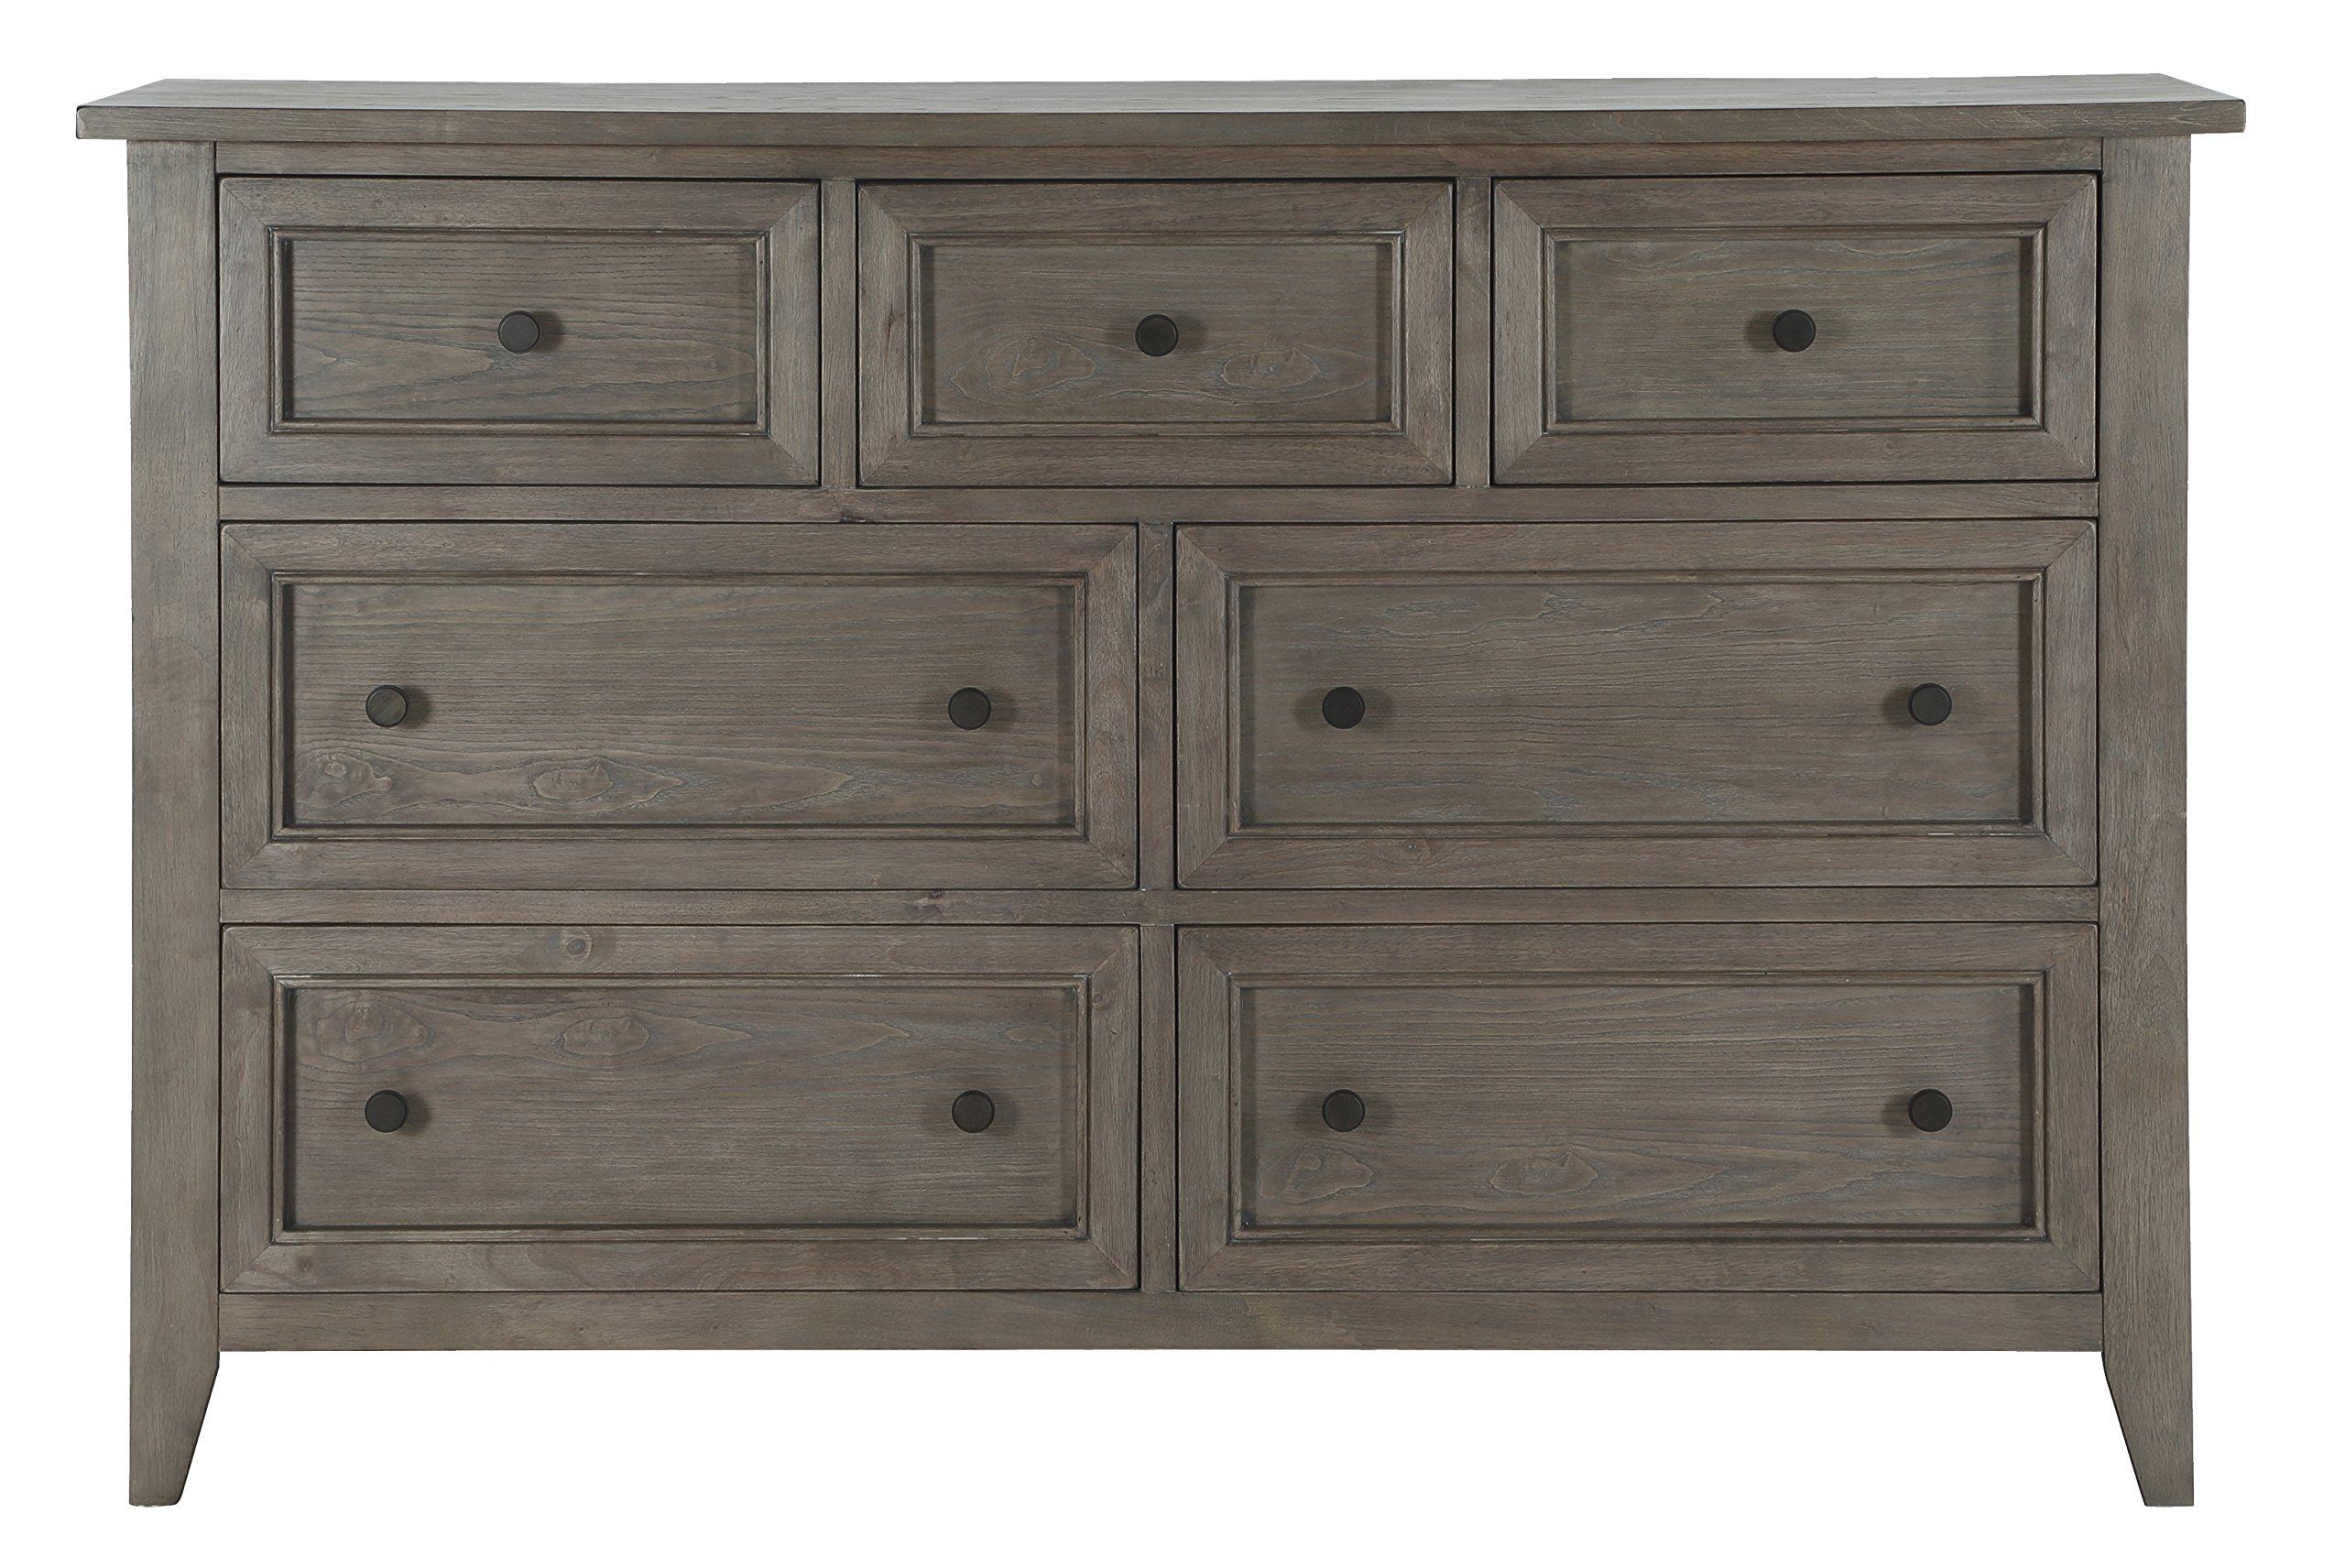 Magnussen B3744-20 Talbot 7 Drawer Dresser, Driftwood